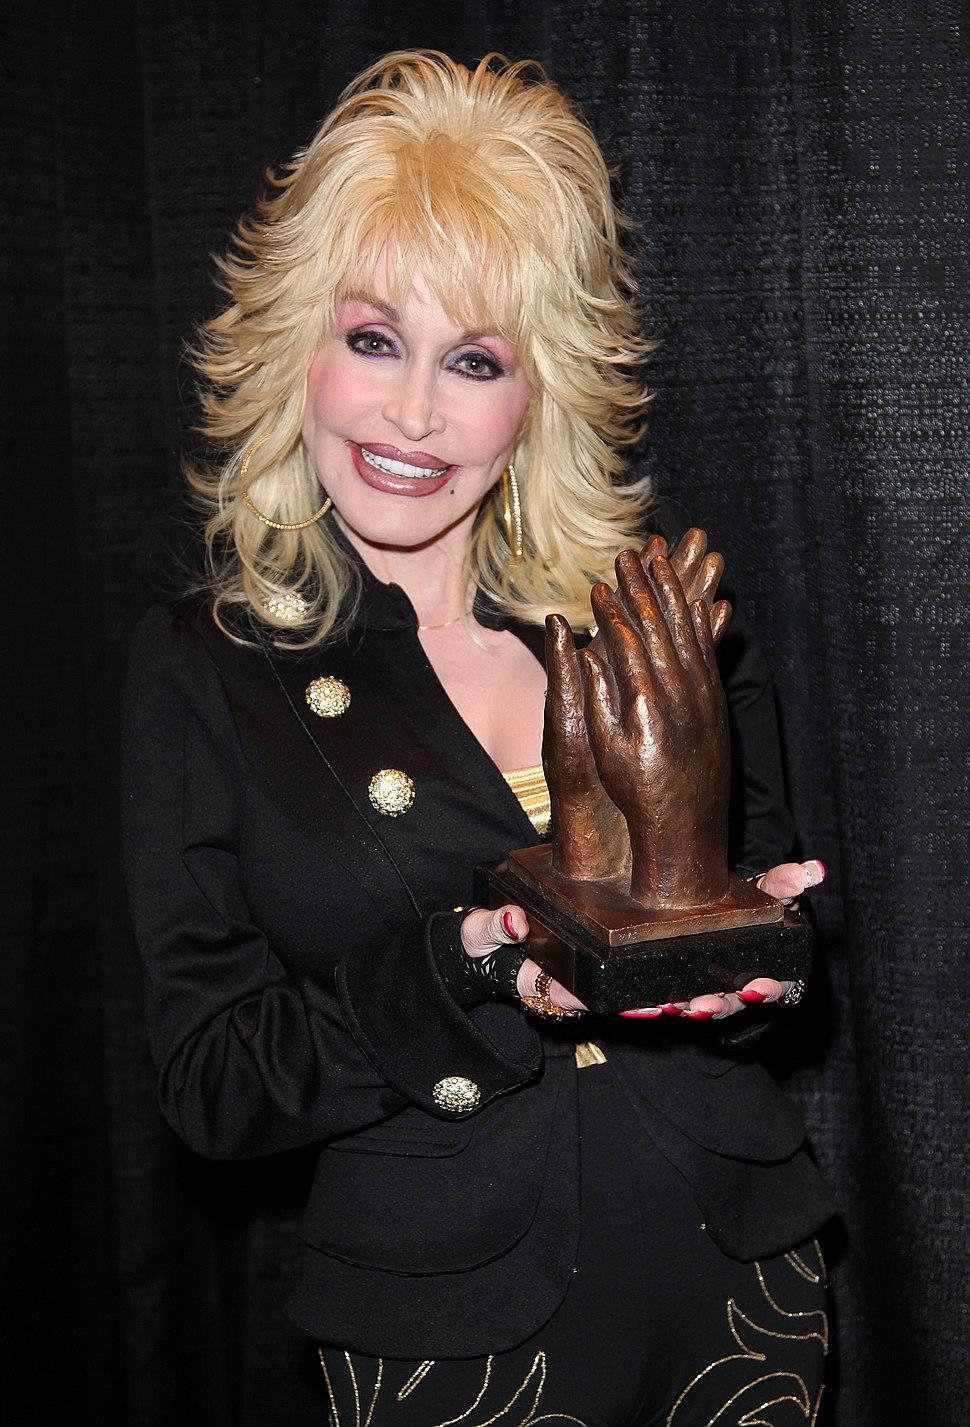 Dolly Parton accepting Liseberg Applause Award 2010 portrait